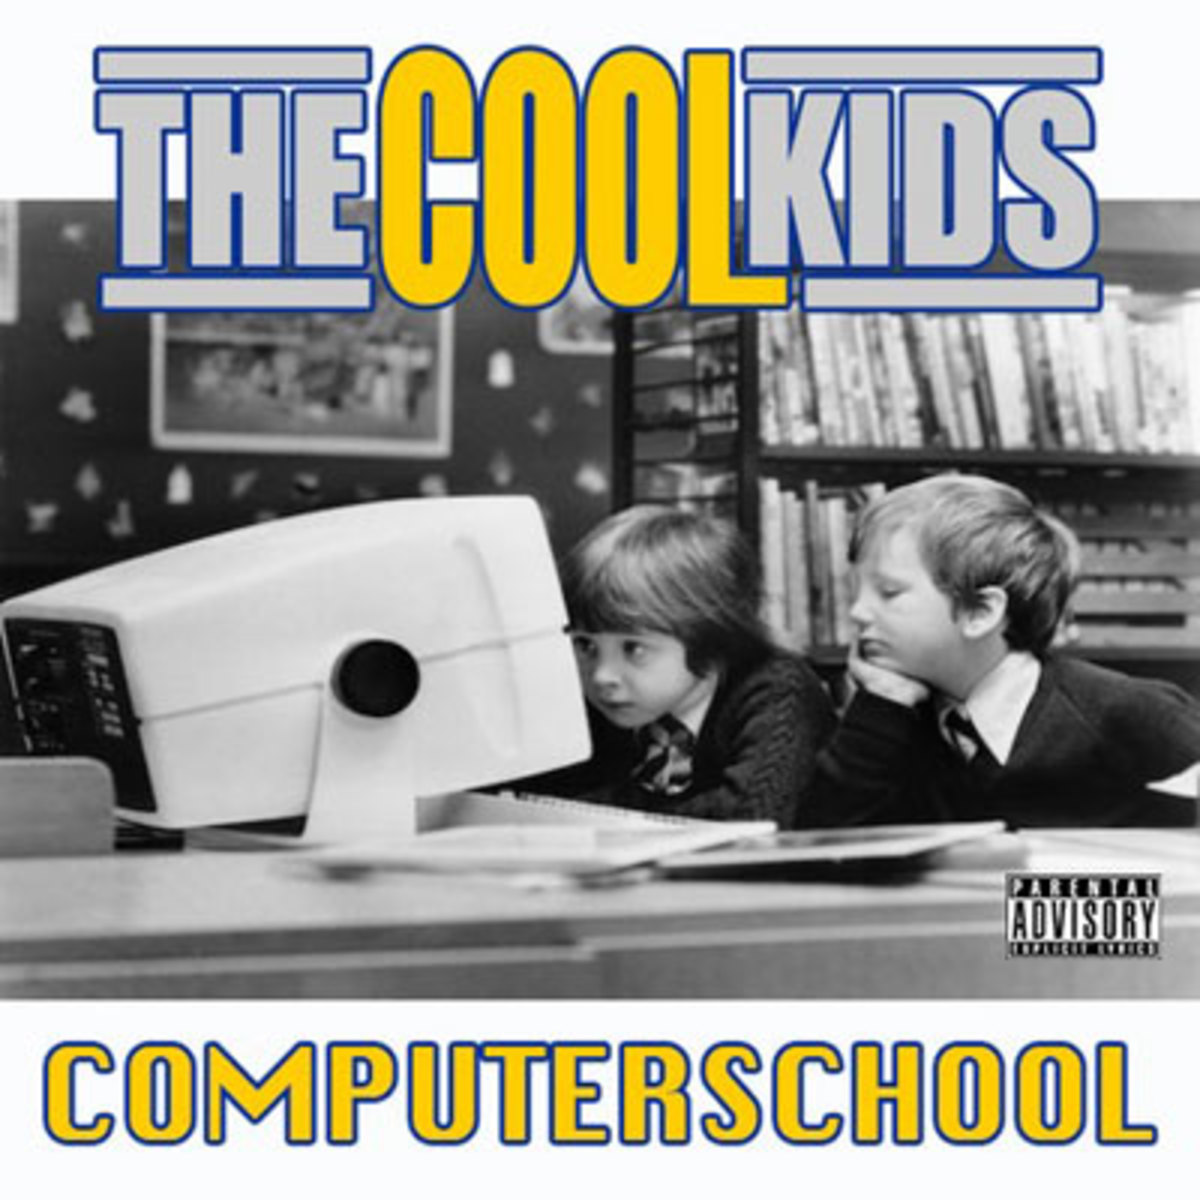 thecoolkids-computerschool.jpg